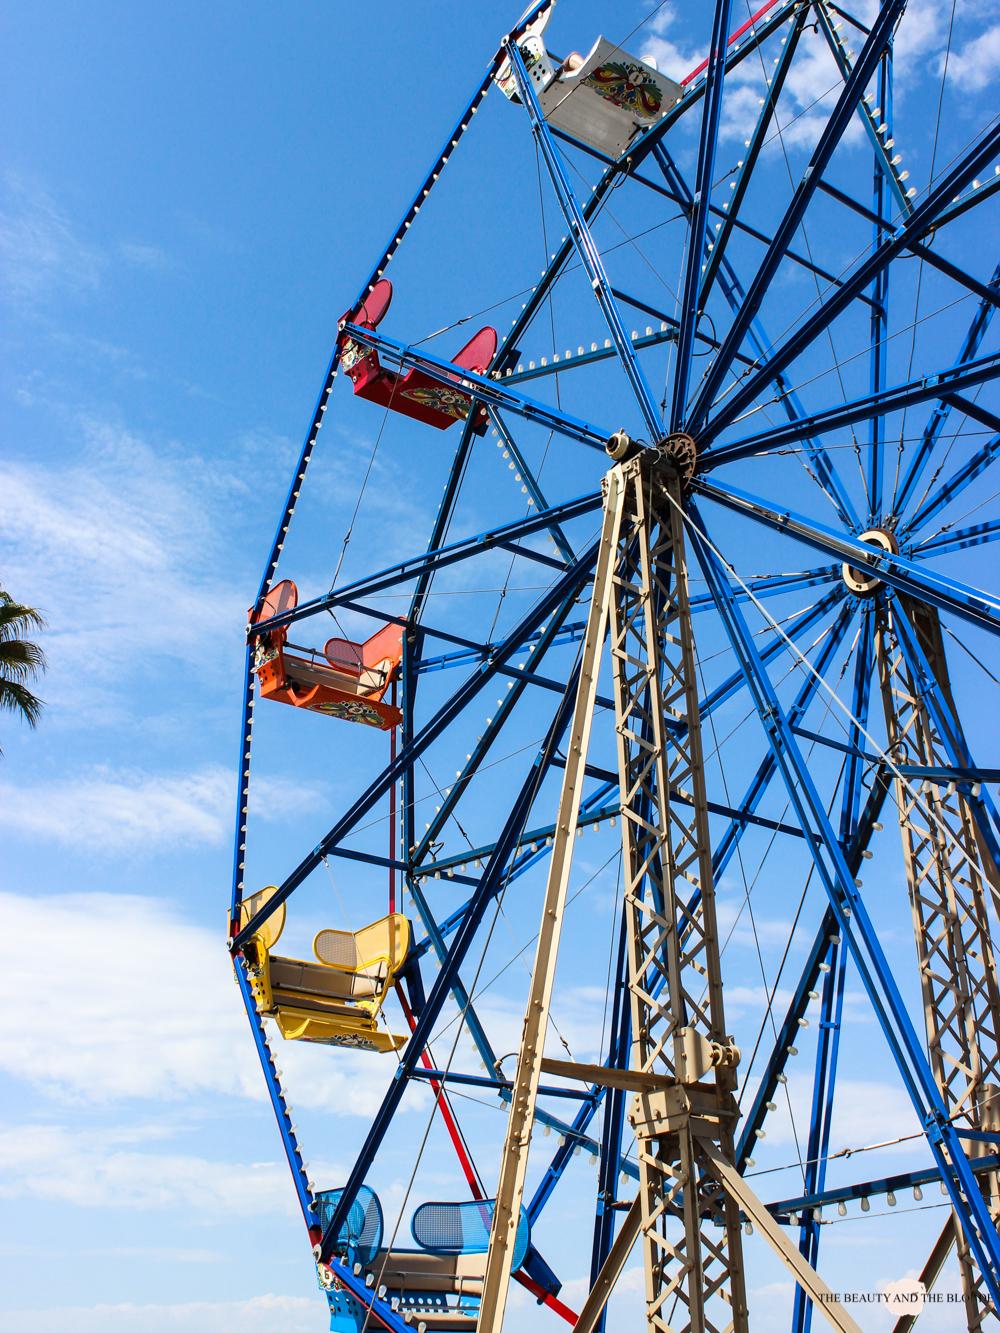 Newport Beach Ferris Wheel Roadtrip Westcoast USA